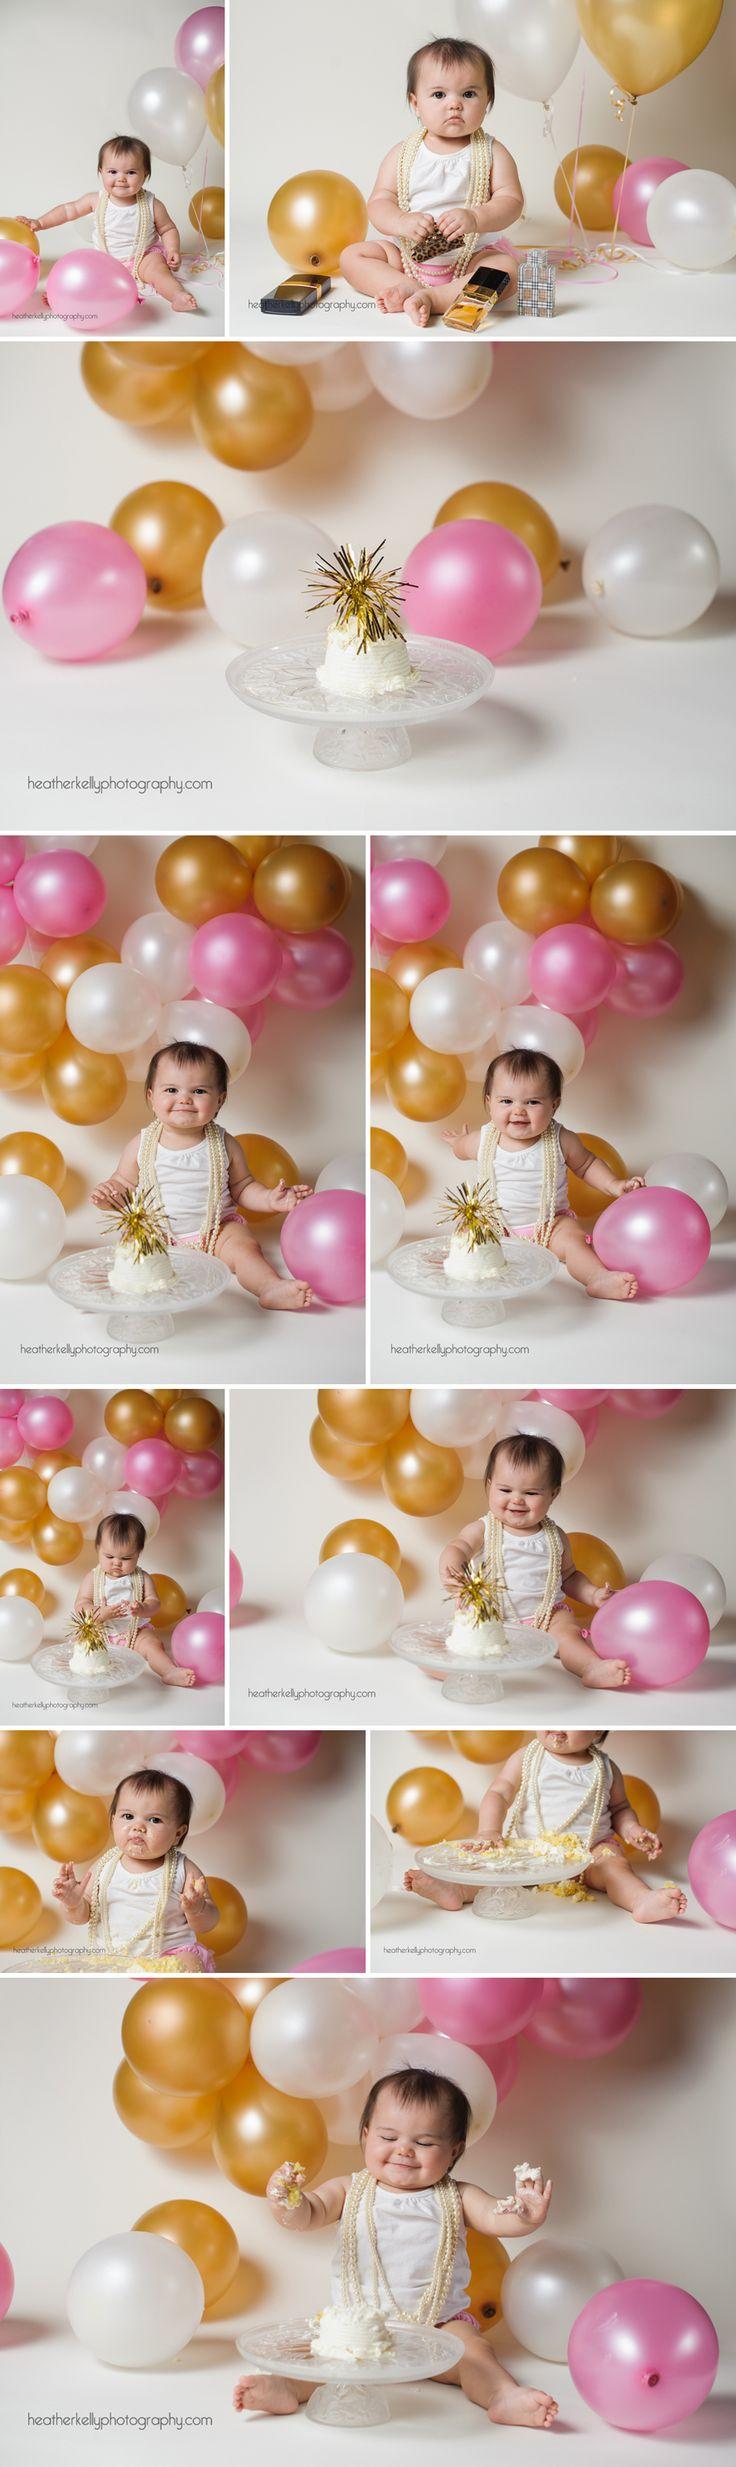 First birthday - CT baby photographer - Heather Kelly Photography - balloon cake smash